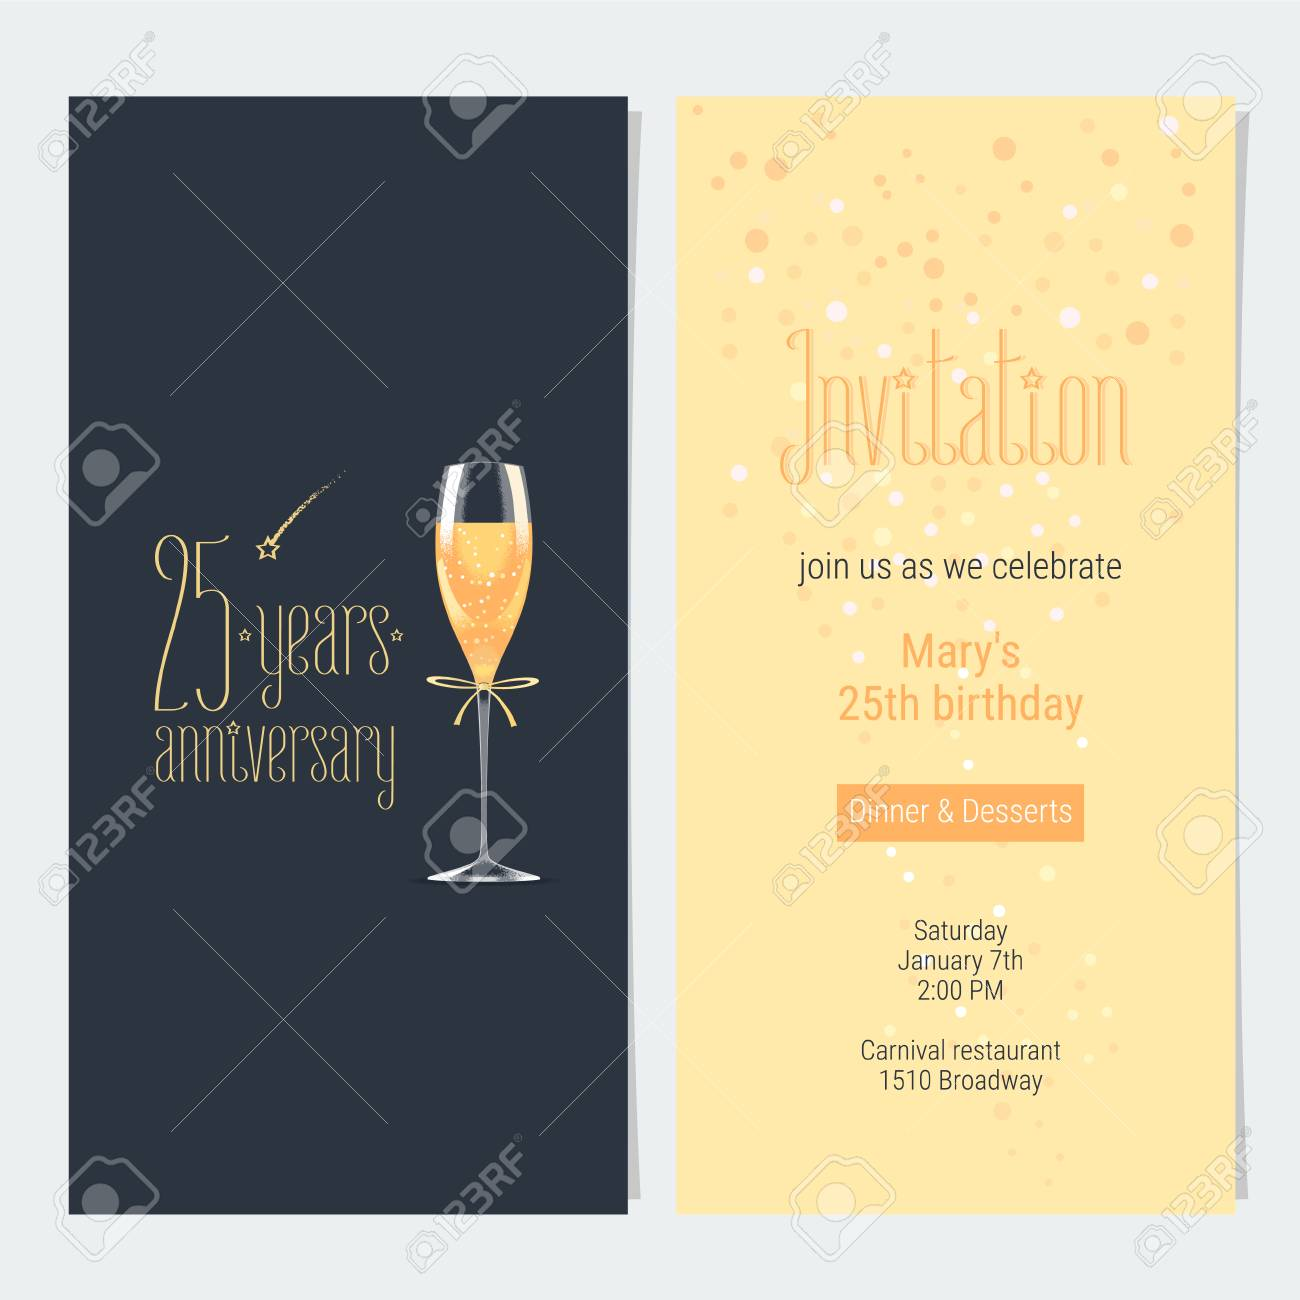 25 Years Anniversary Invitation Vector Illustration Design Element